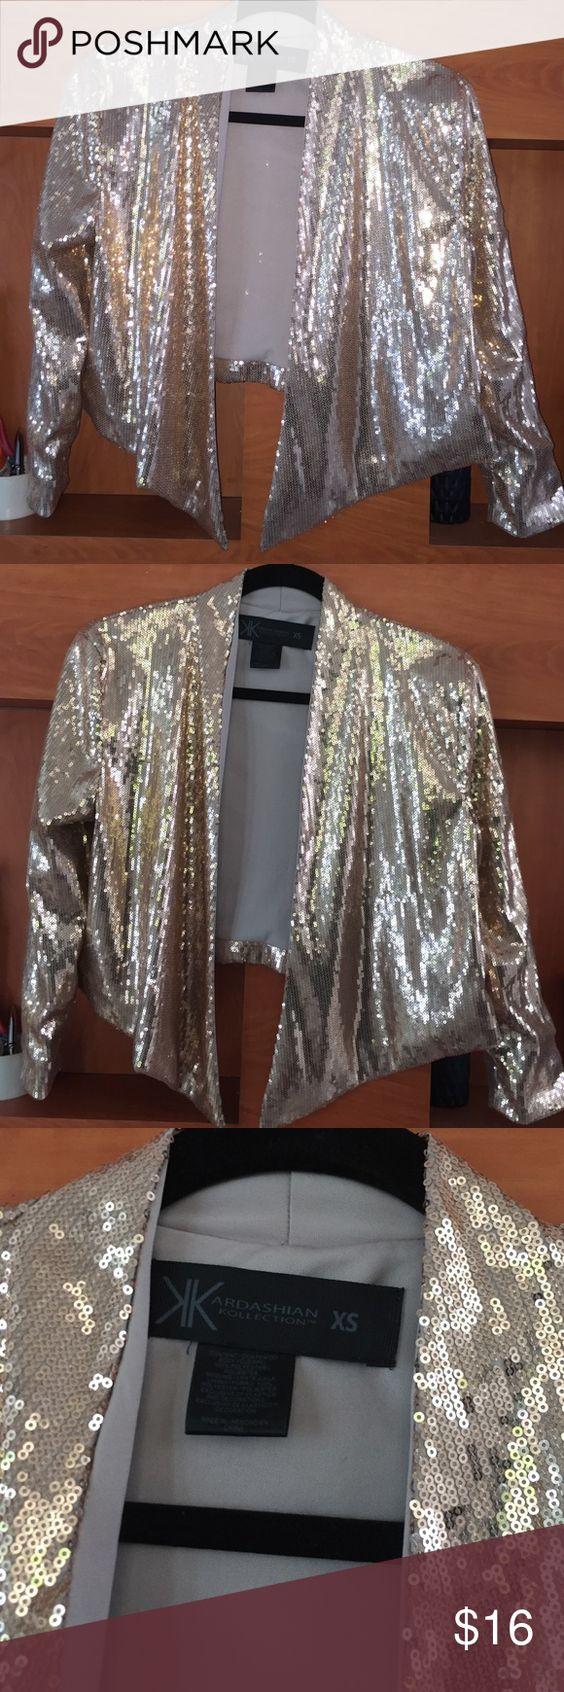 Kardashian collection shine crop blazer Wore once for Christmas crop blazer.very shiny and cute style crop blazer Kardashian Kollection Jackets & Coats Blazers